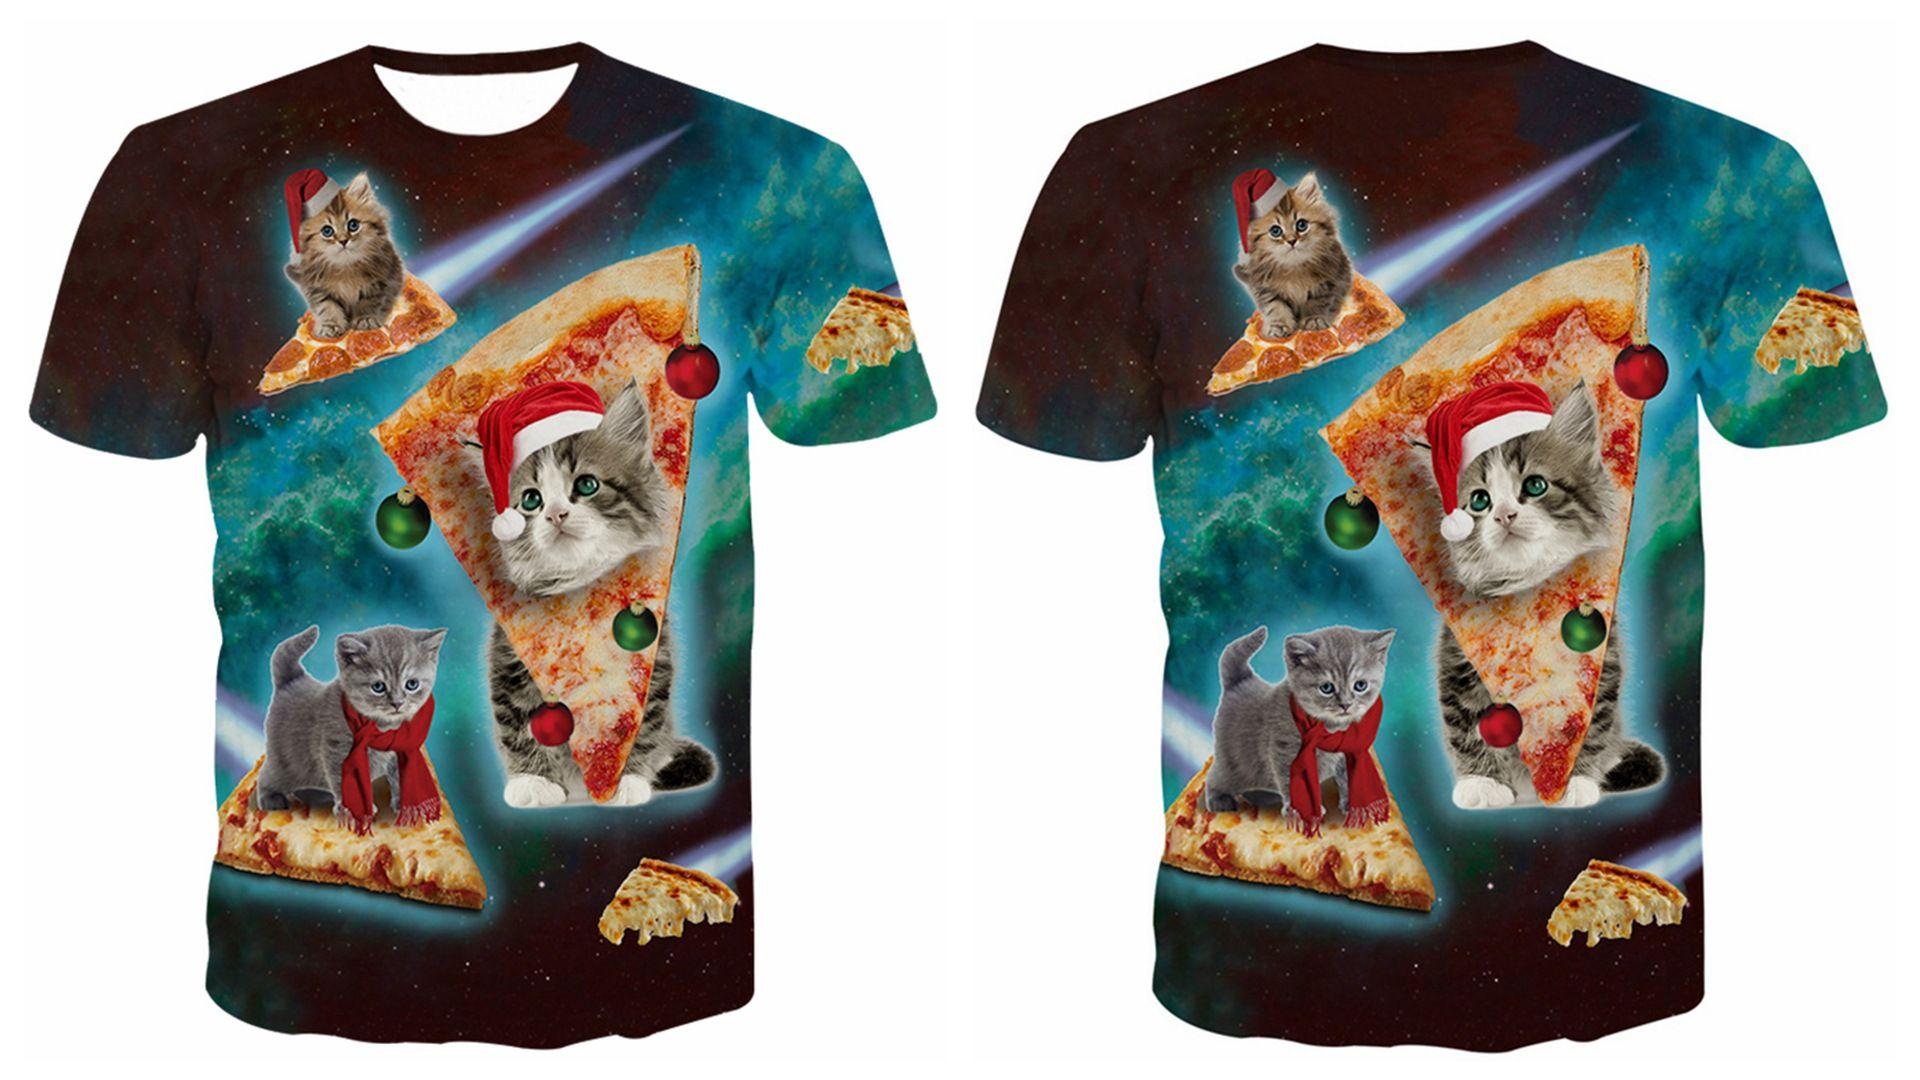 Burst T Shirt Shirt Animal Laser Cat Casual Beach fortable 3d